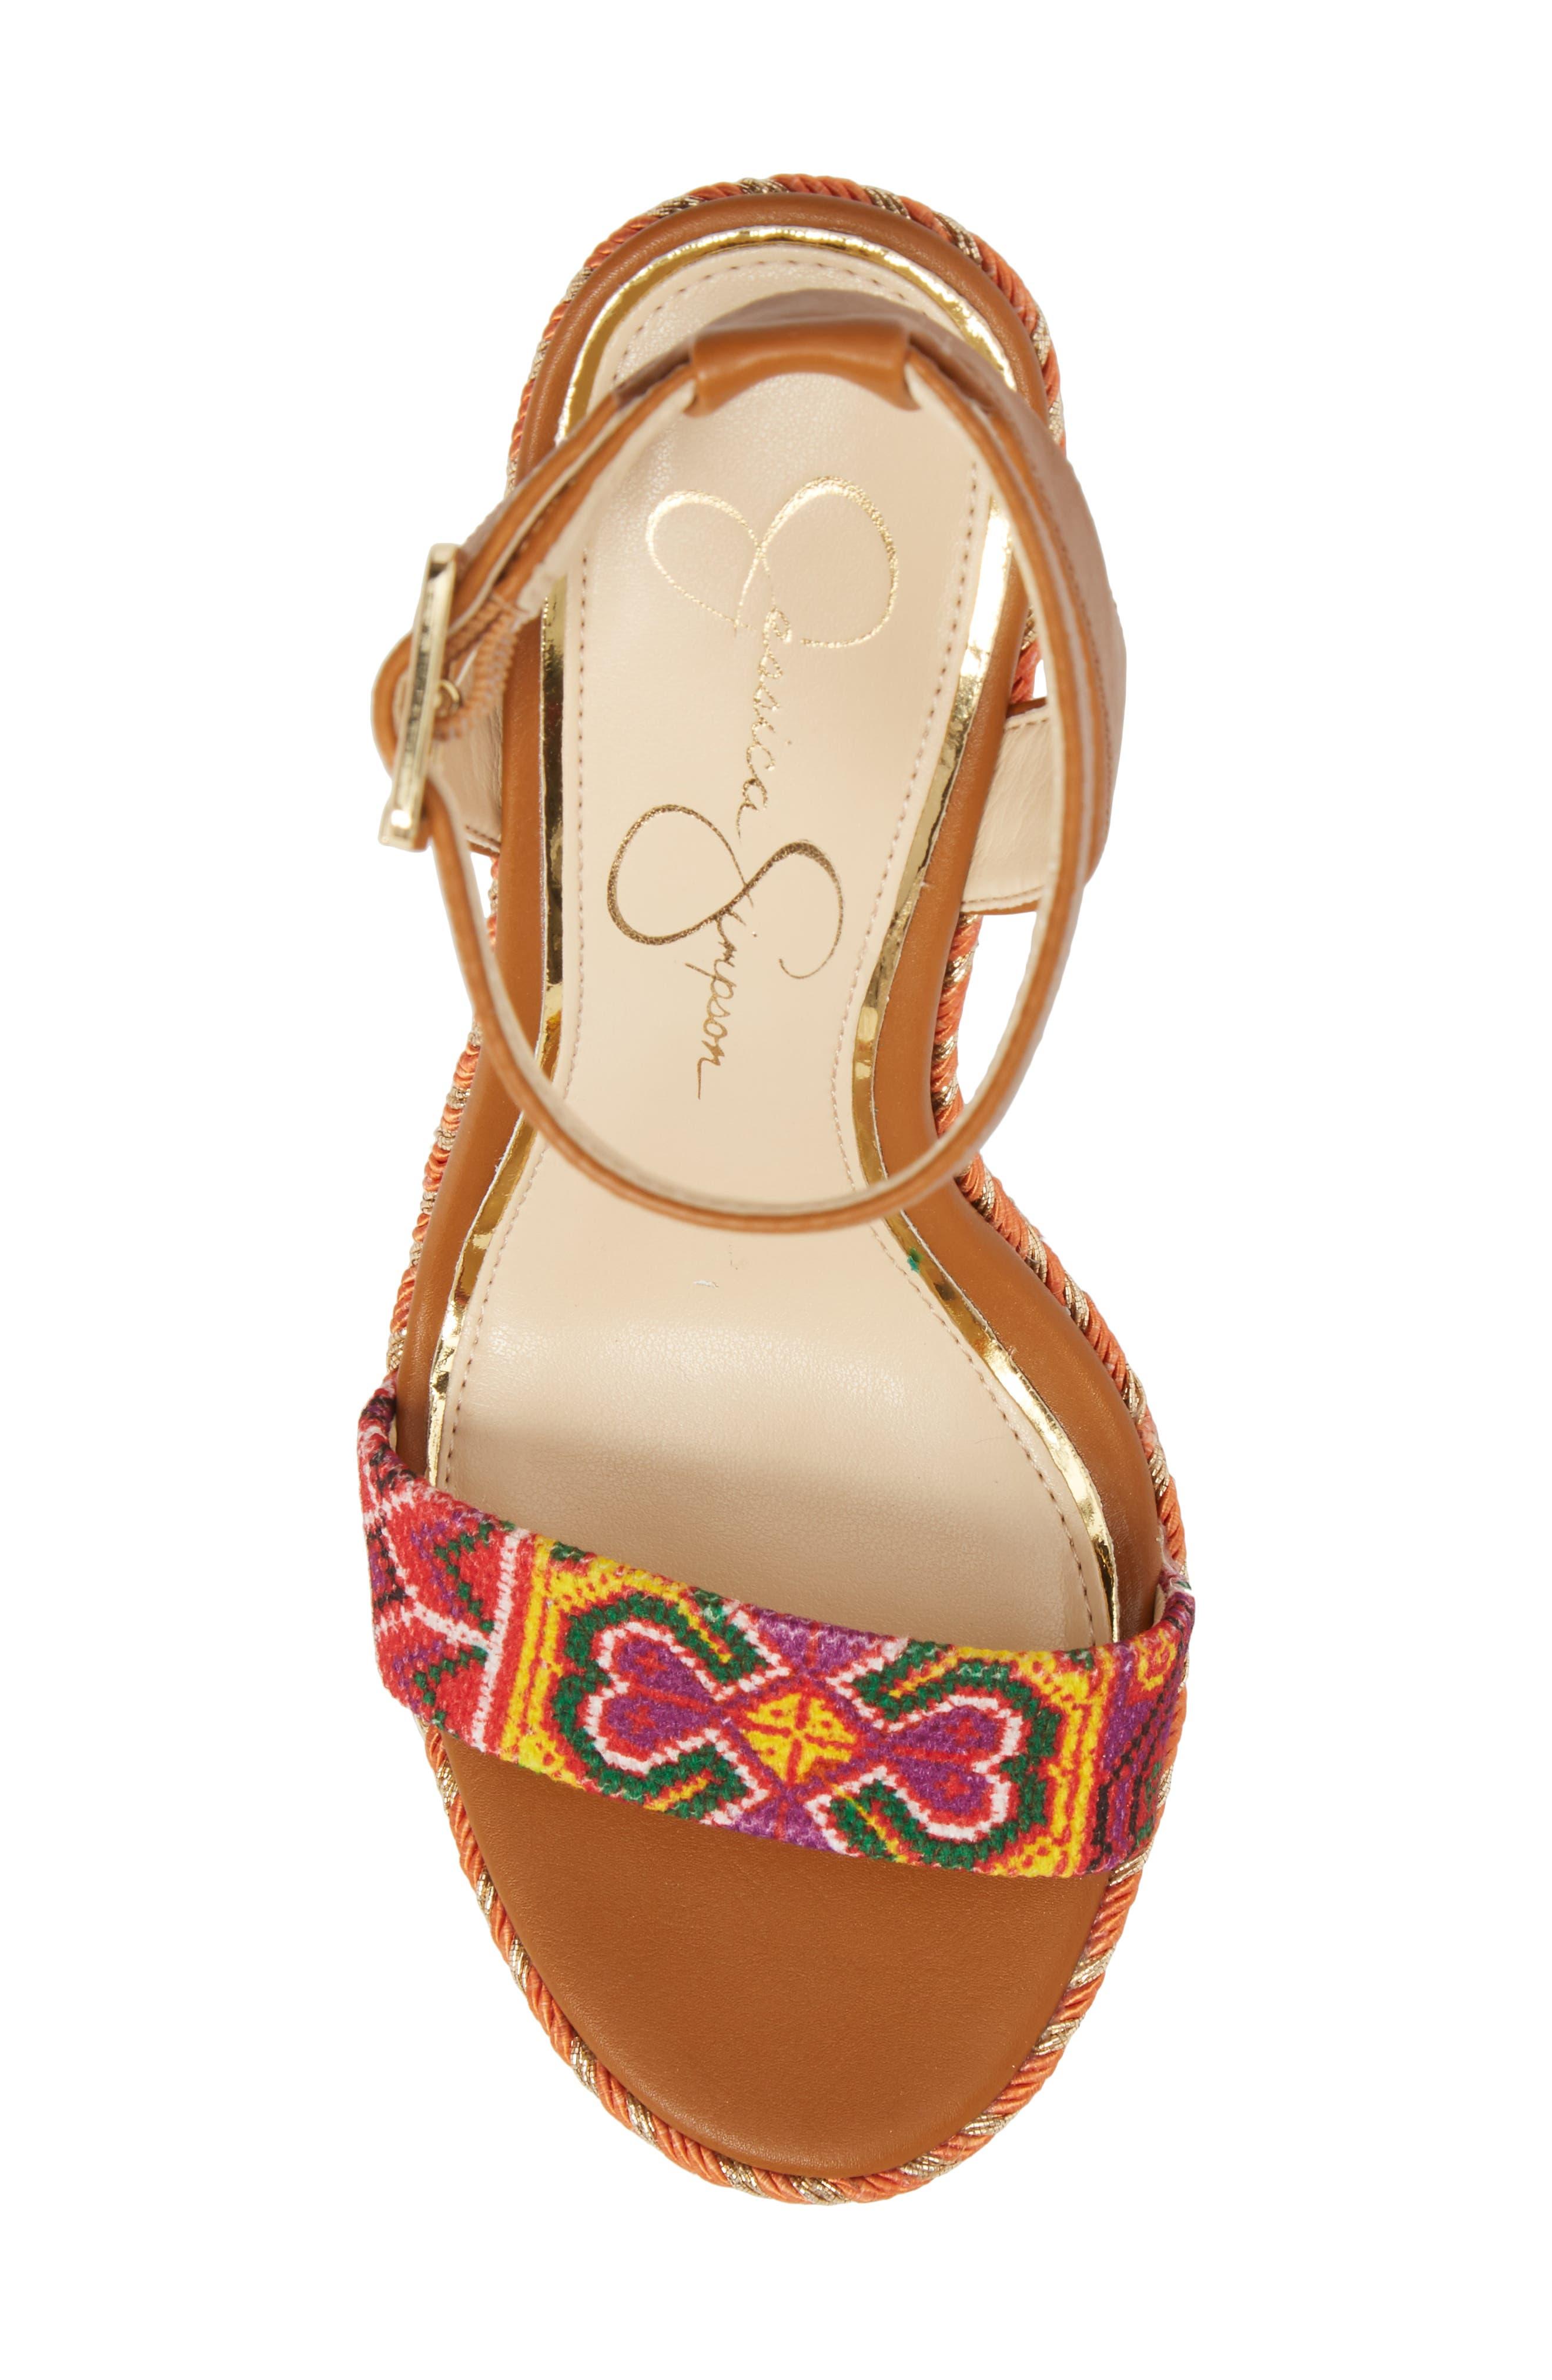 Alinda Embellished Wedge Sandal,                             Alternate thumbnail 10, color,